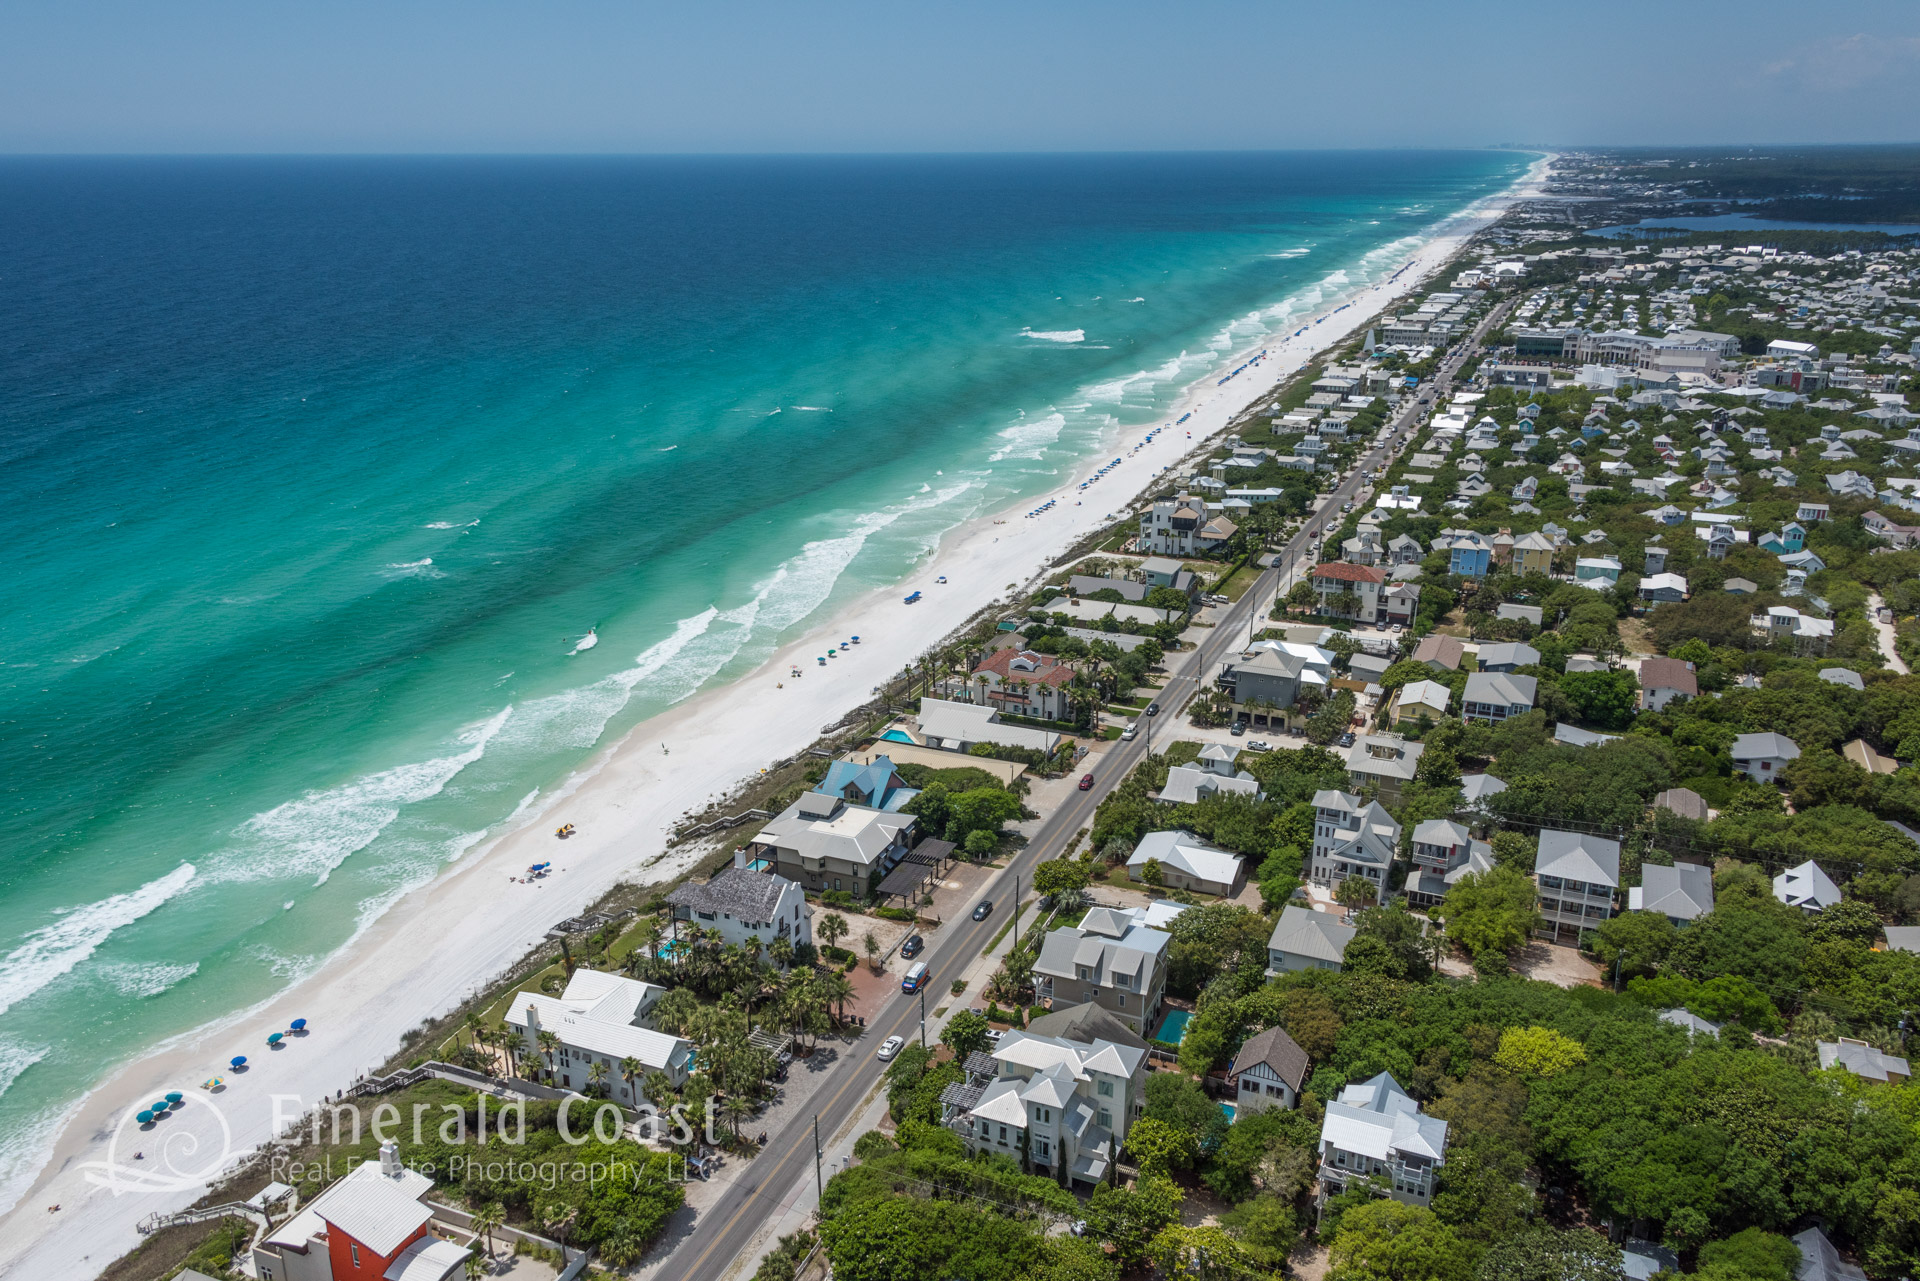 Aerial photo of Santa Rosa beach, florida